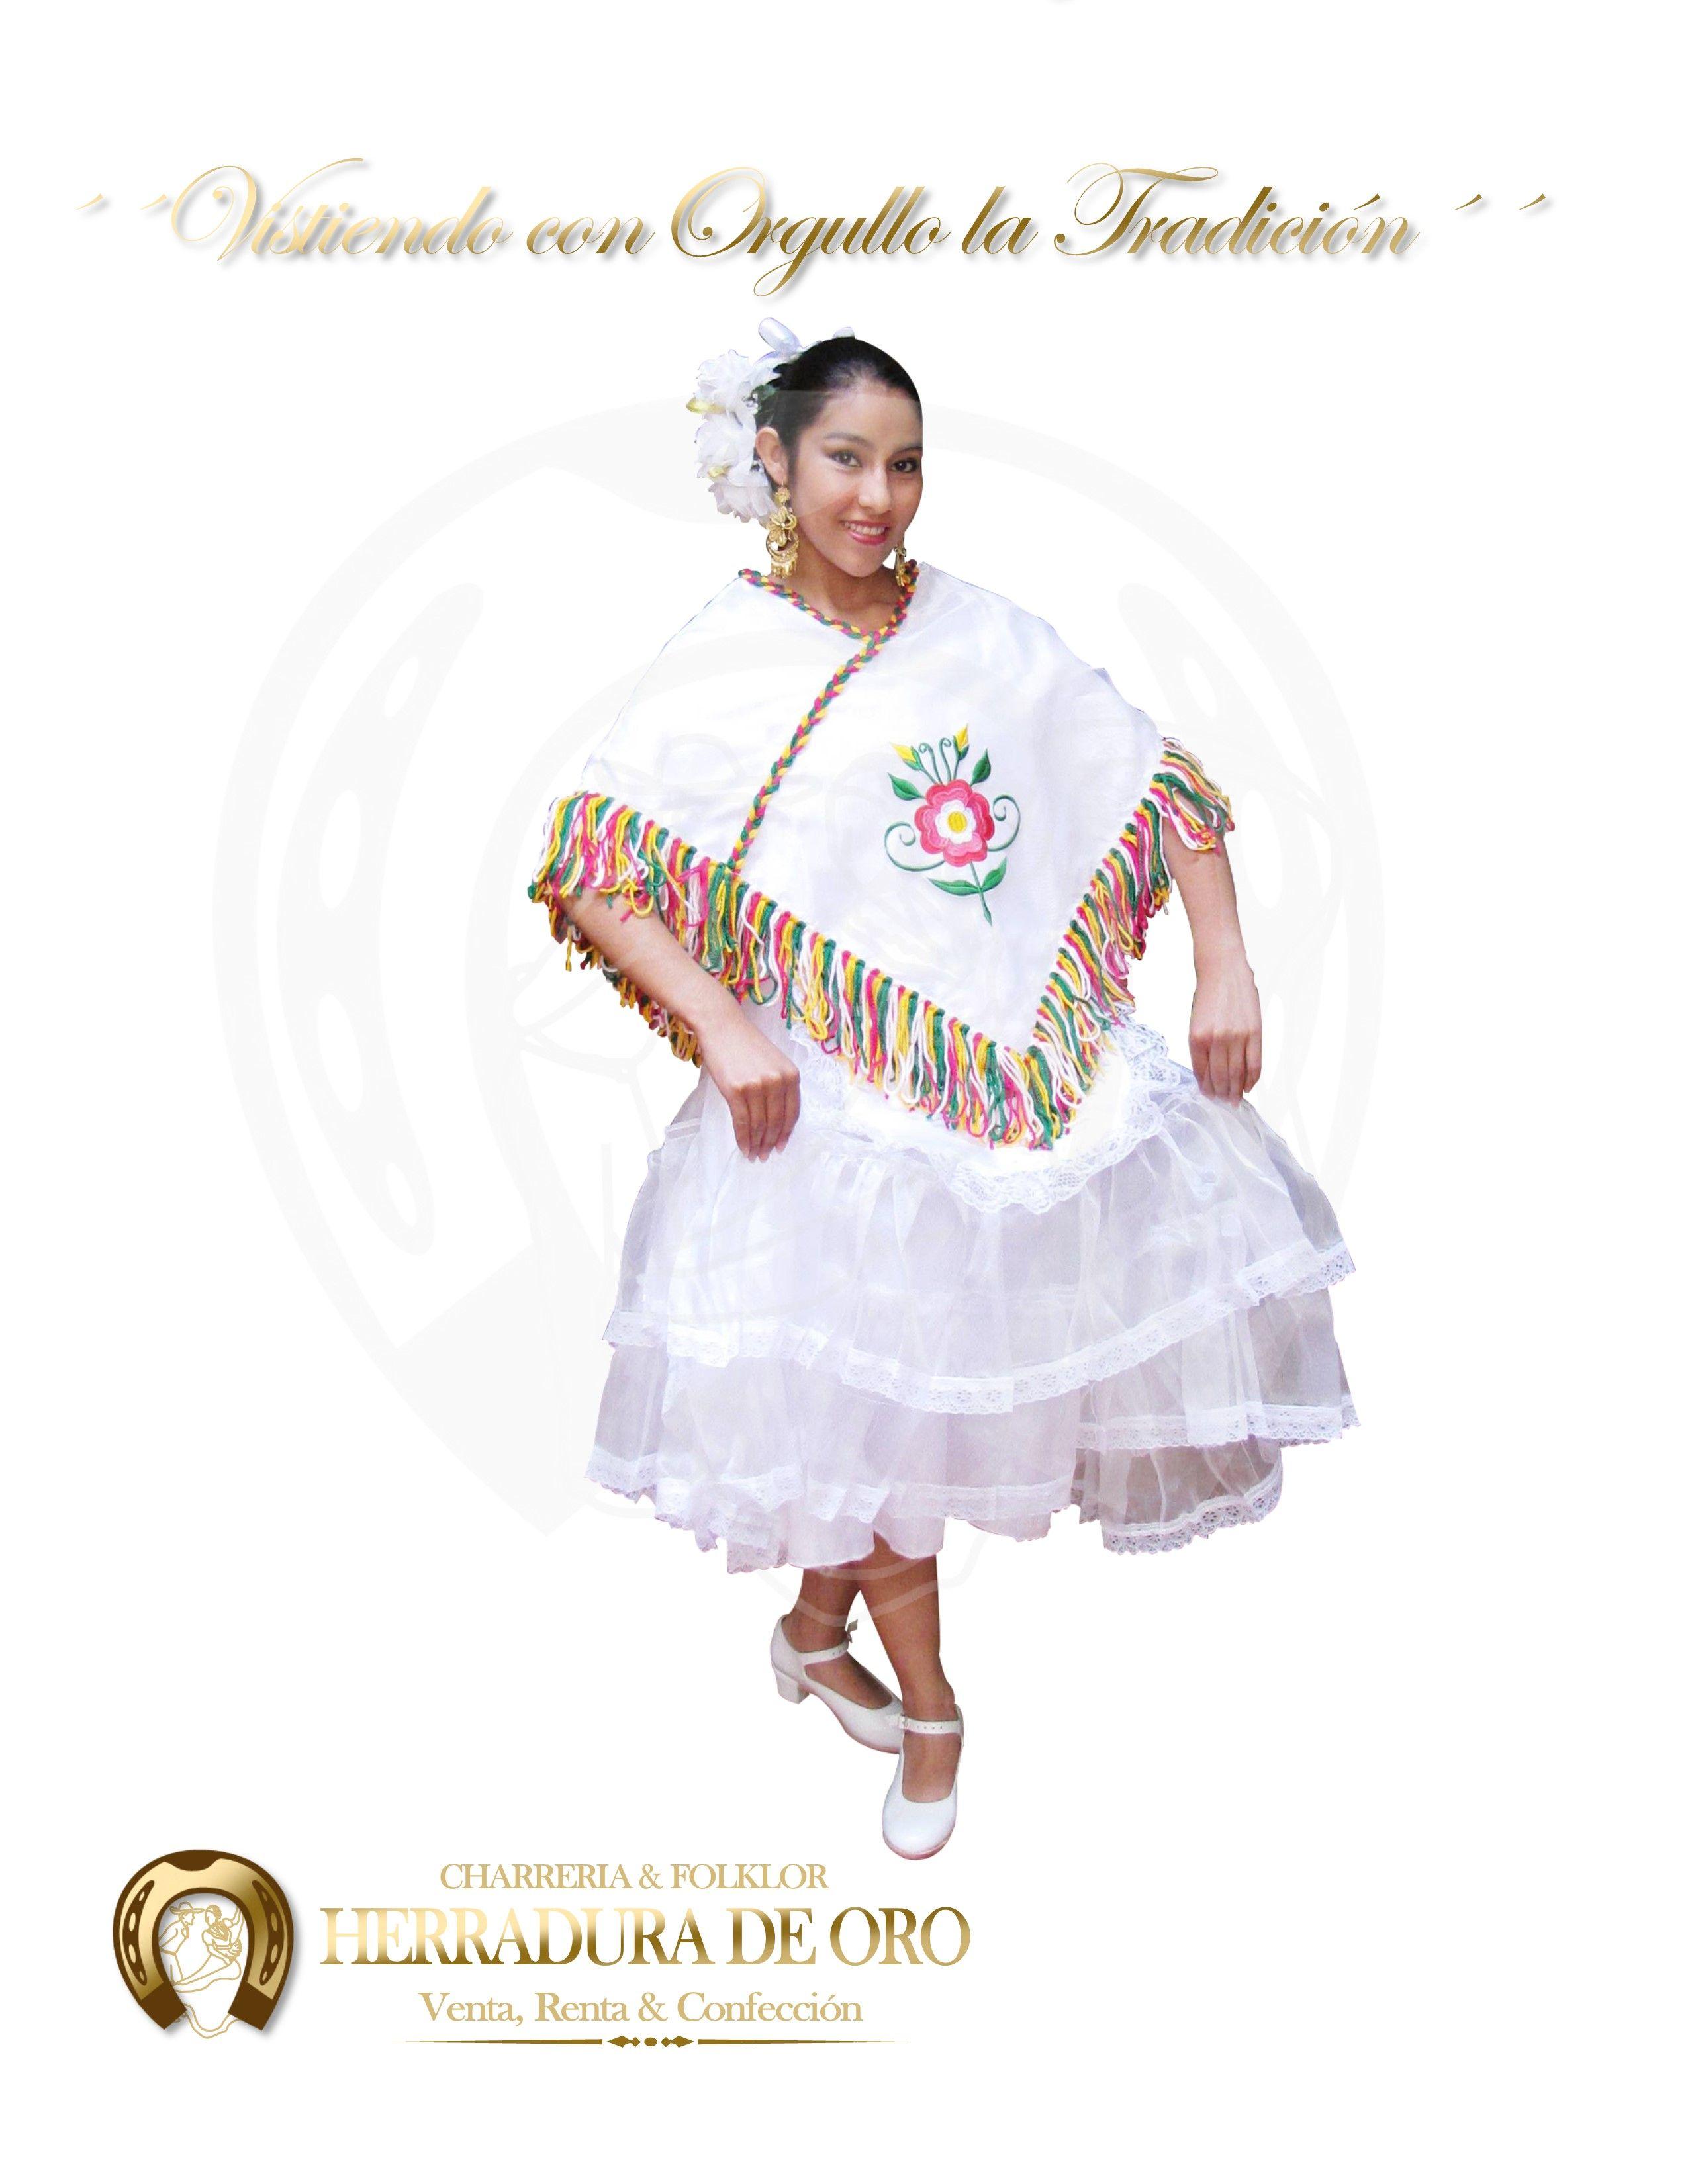 Venta de vestidos de primera comunion en tijuana